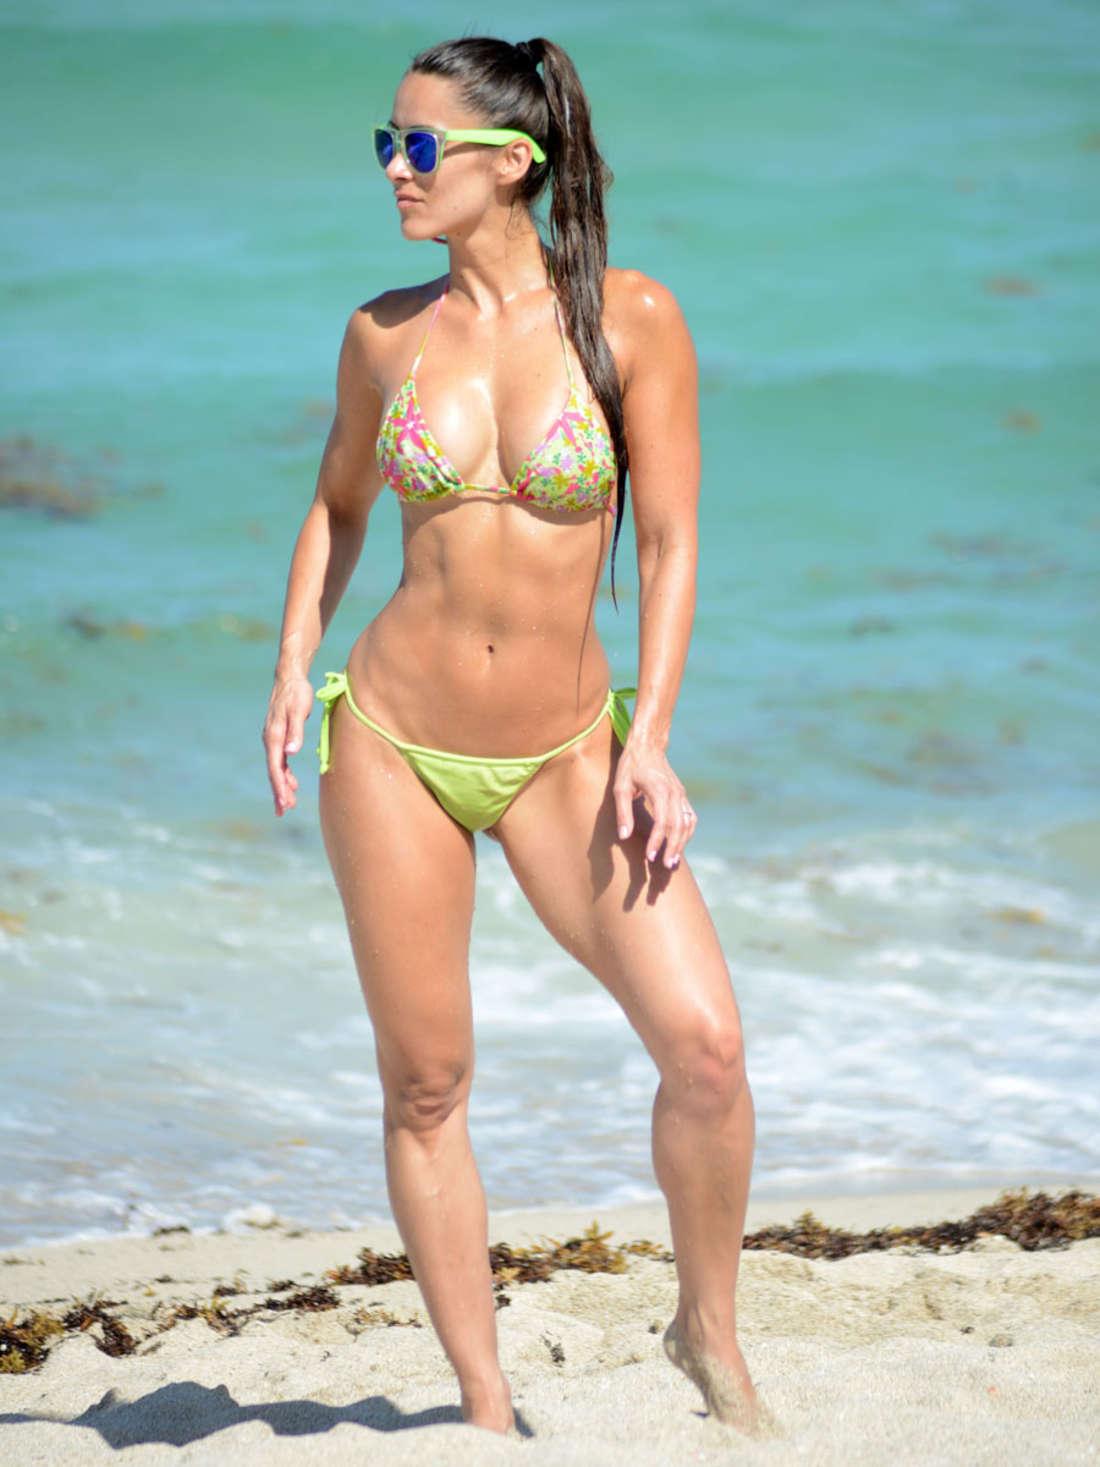 image Jackie nude beach 1 outtake